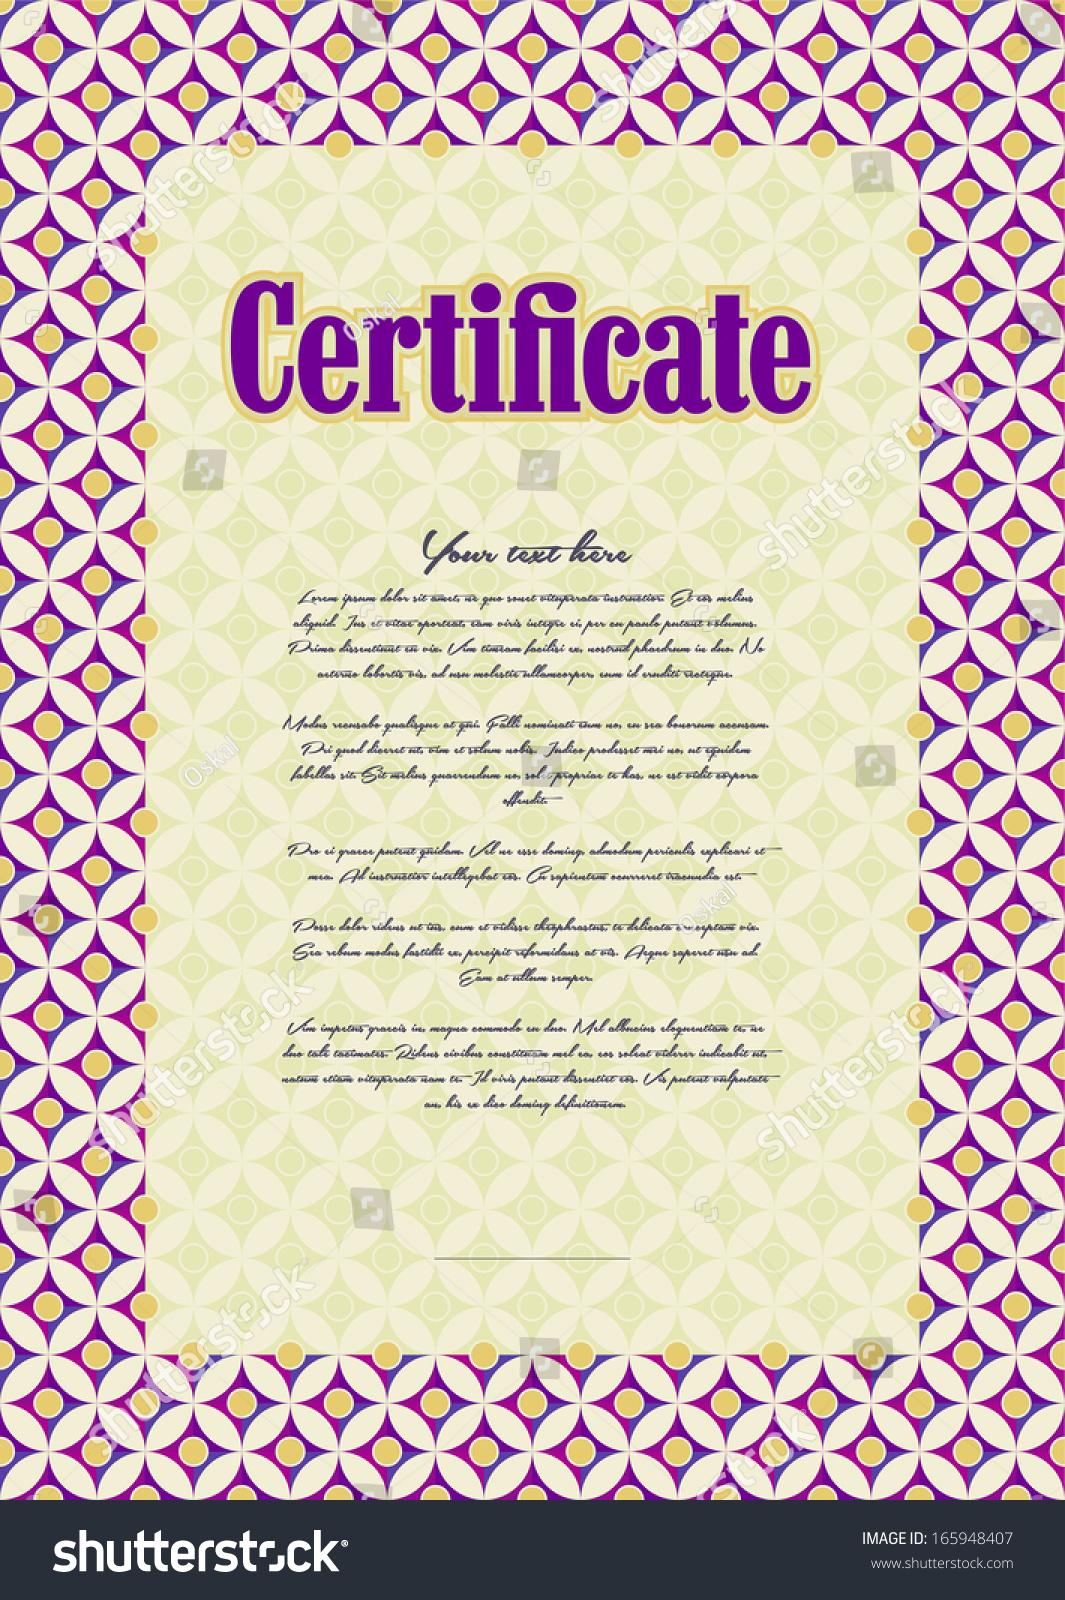 Basis Creating Certificate Diploma T Voucher Stock Vector